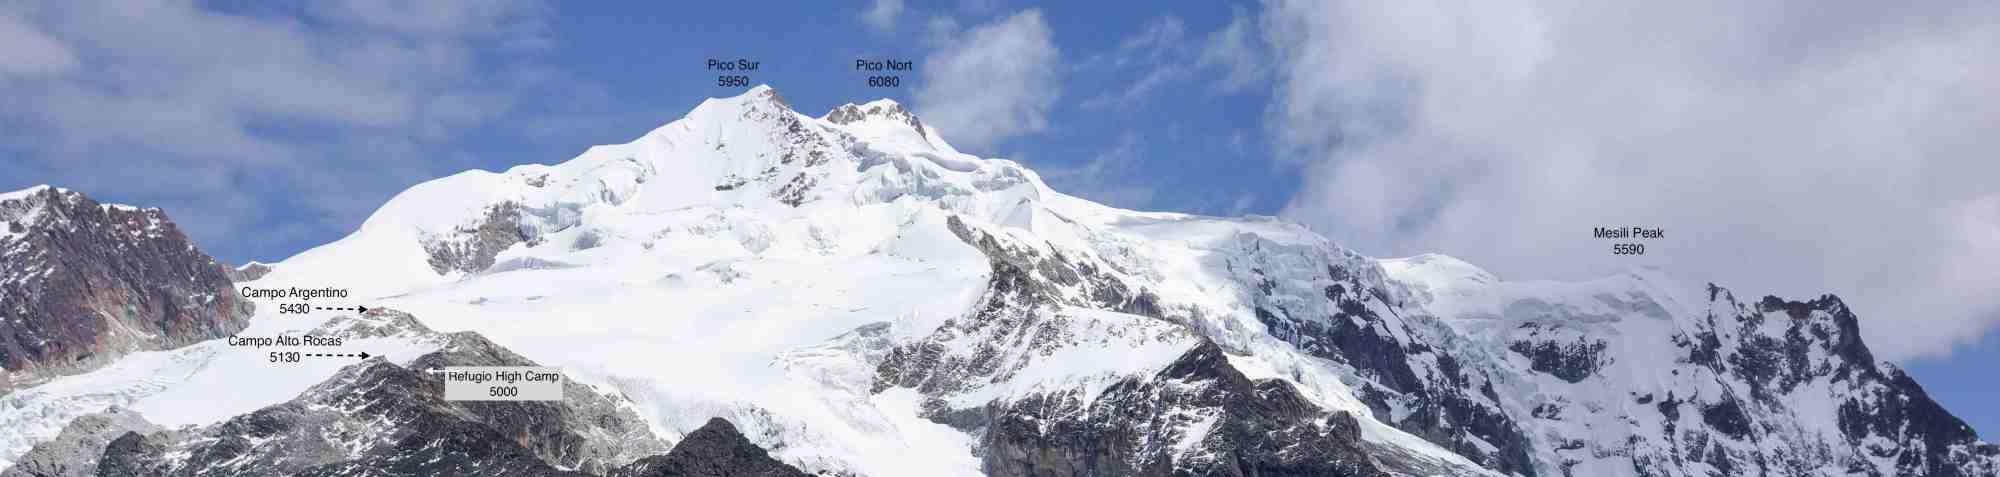 Huayna Potosi Peaks and High Camps